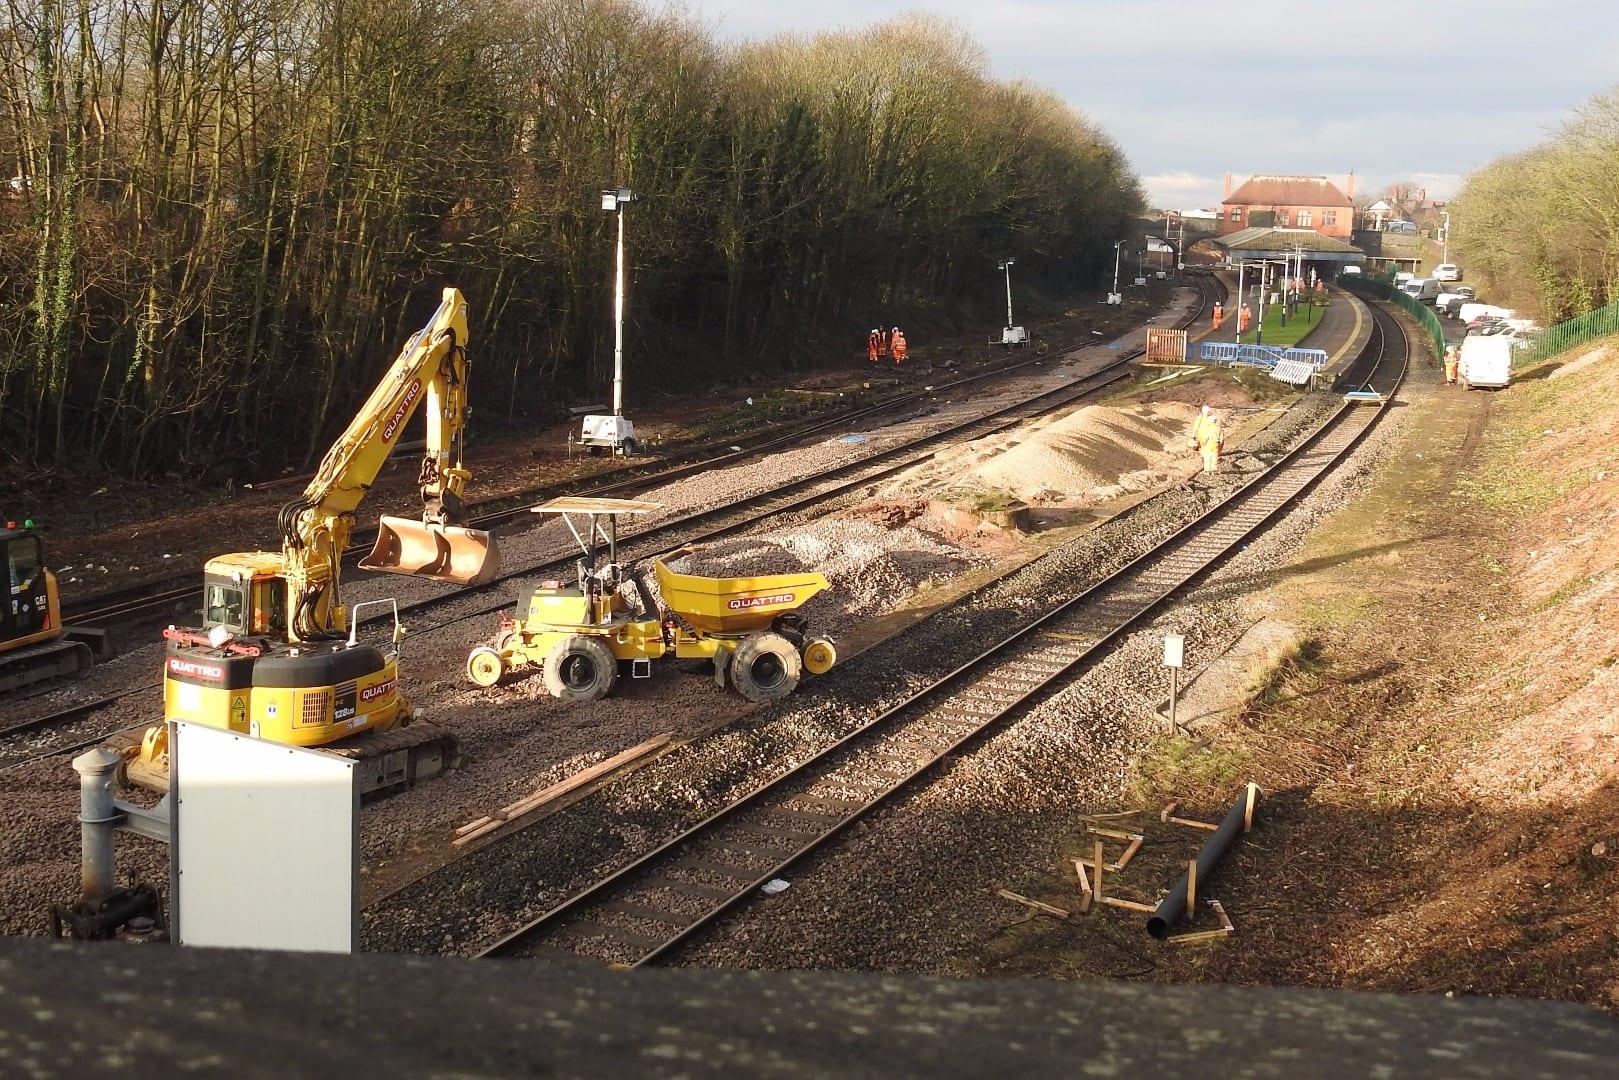 Electrification works underway at Poulton railway station